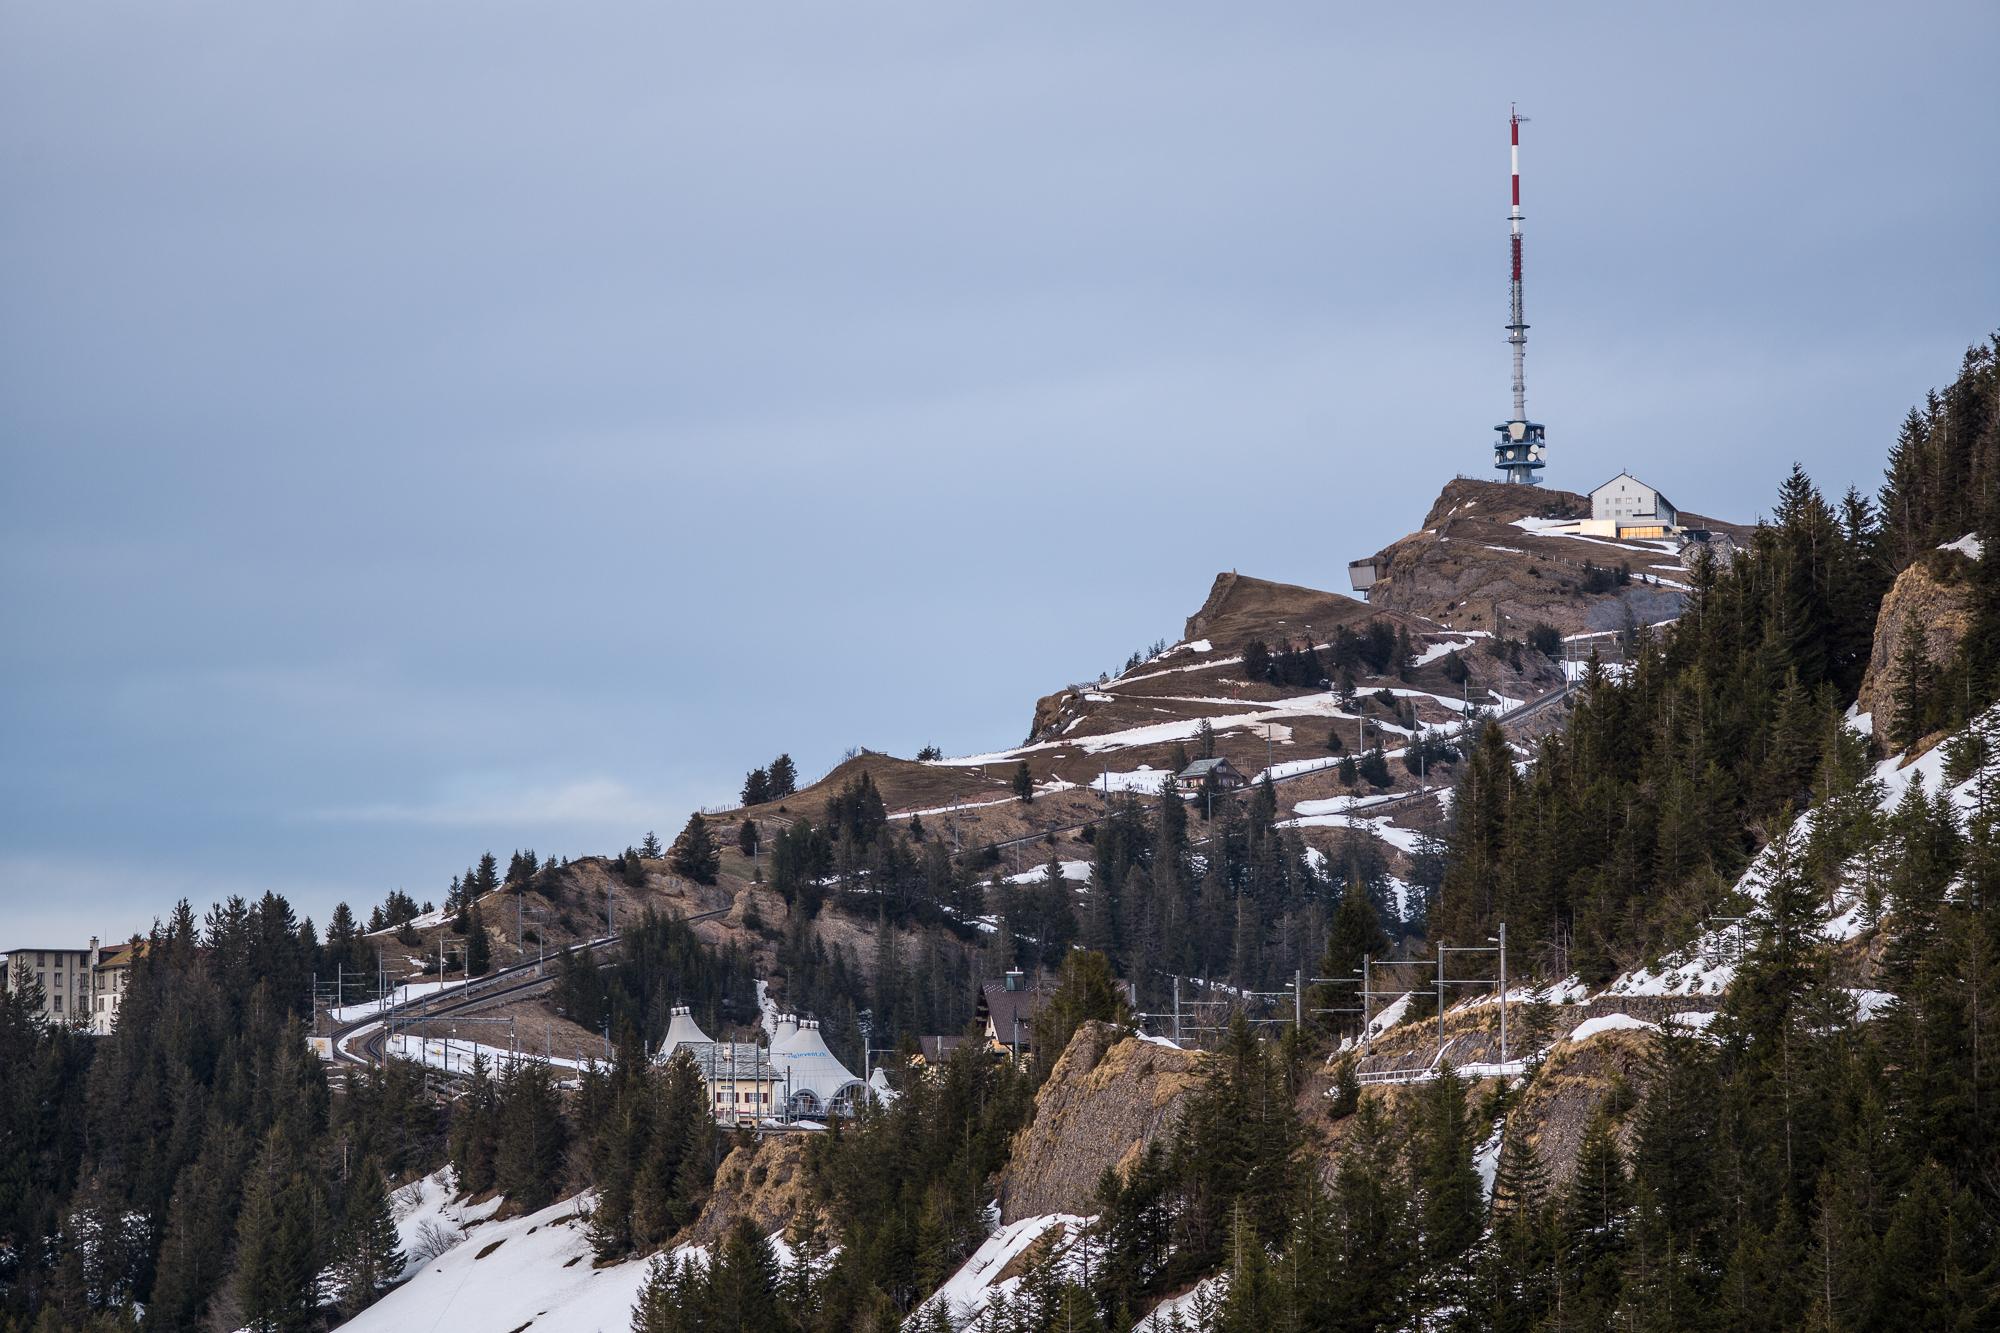 The summit of Rigi Kulm